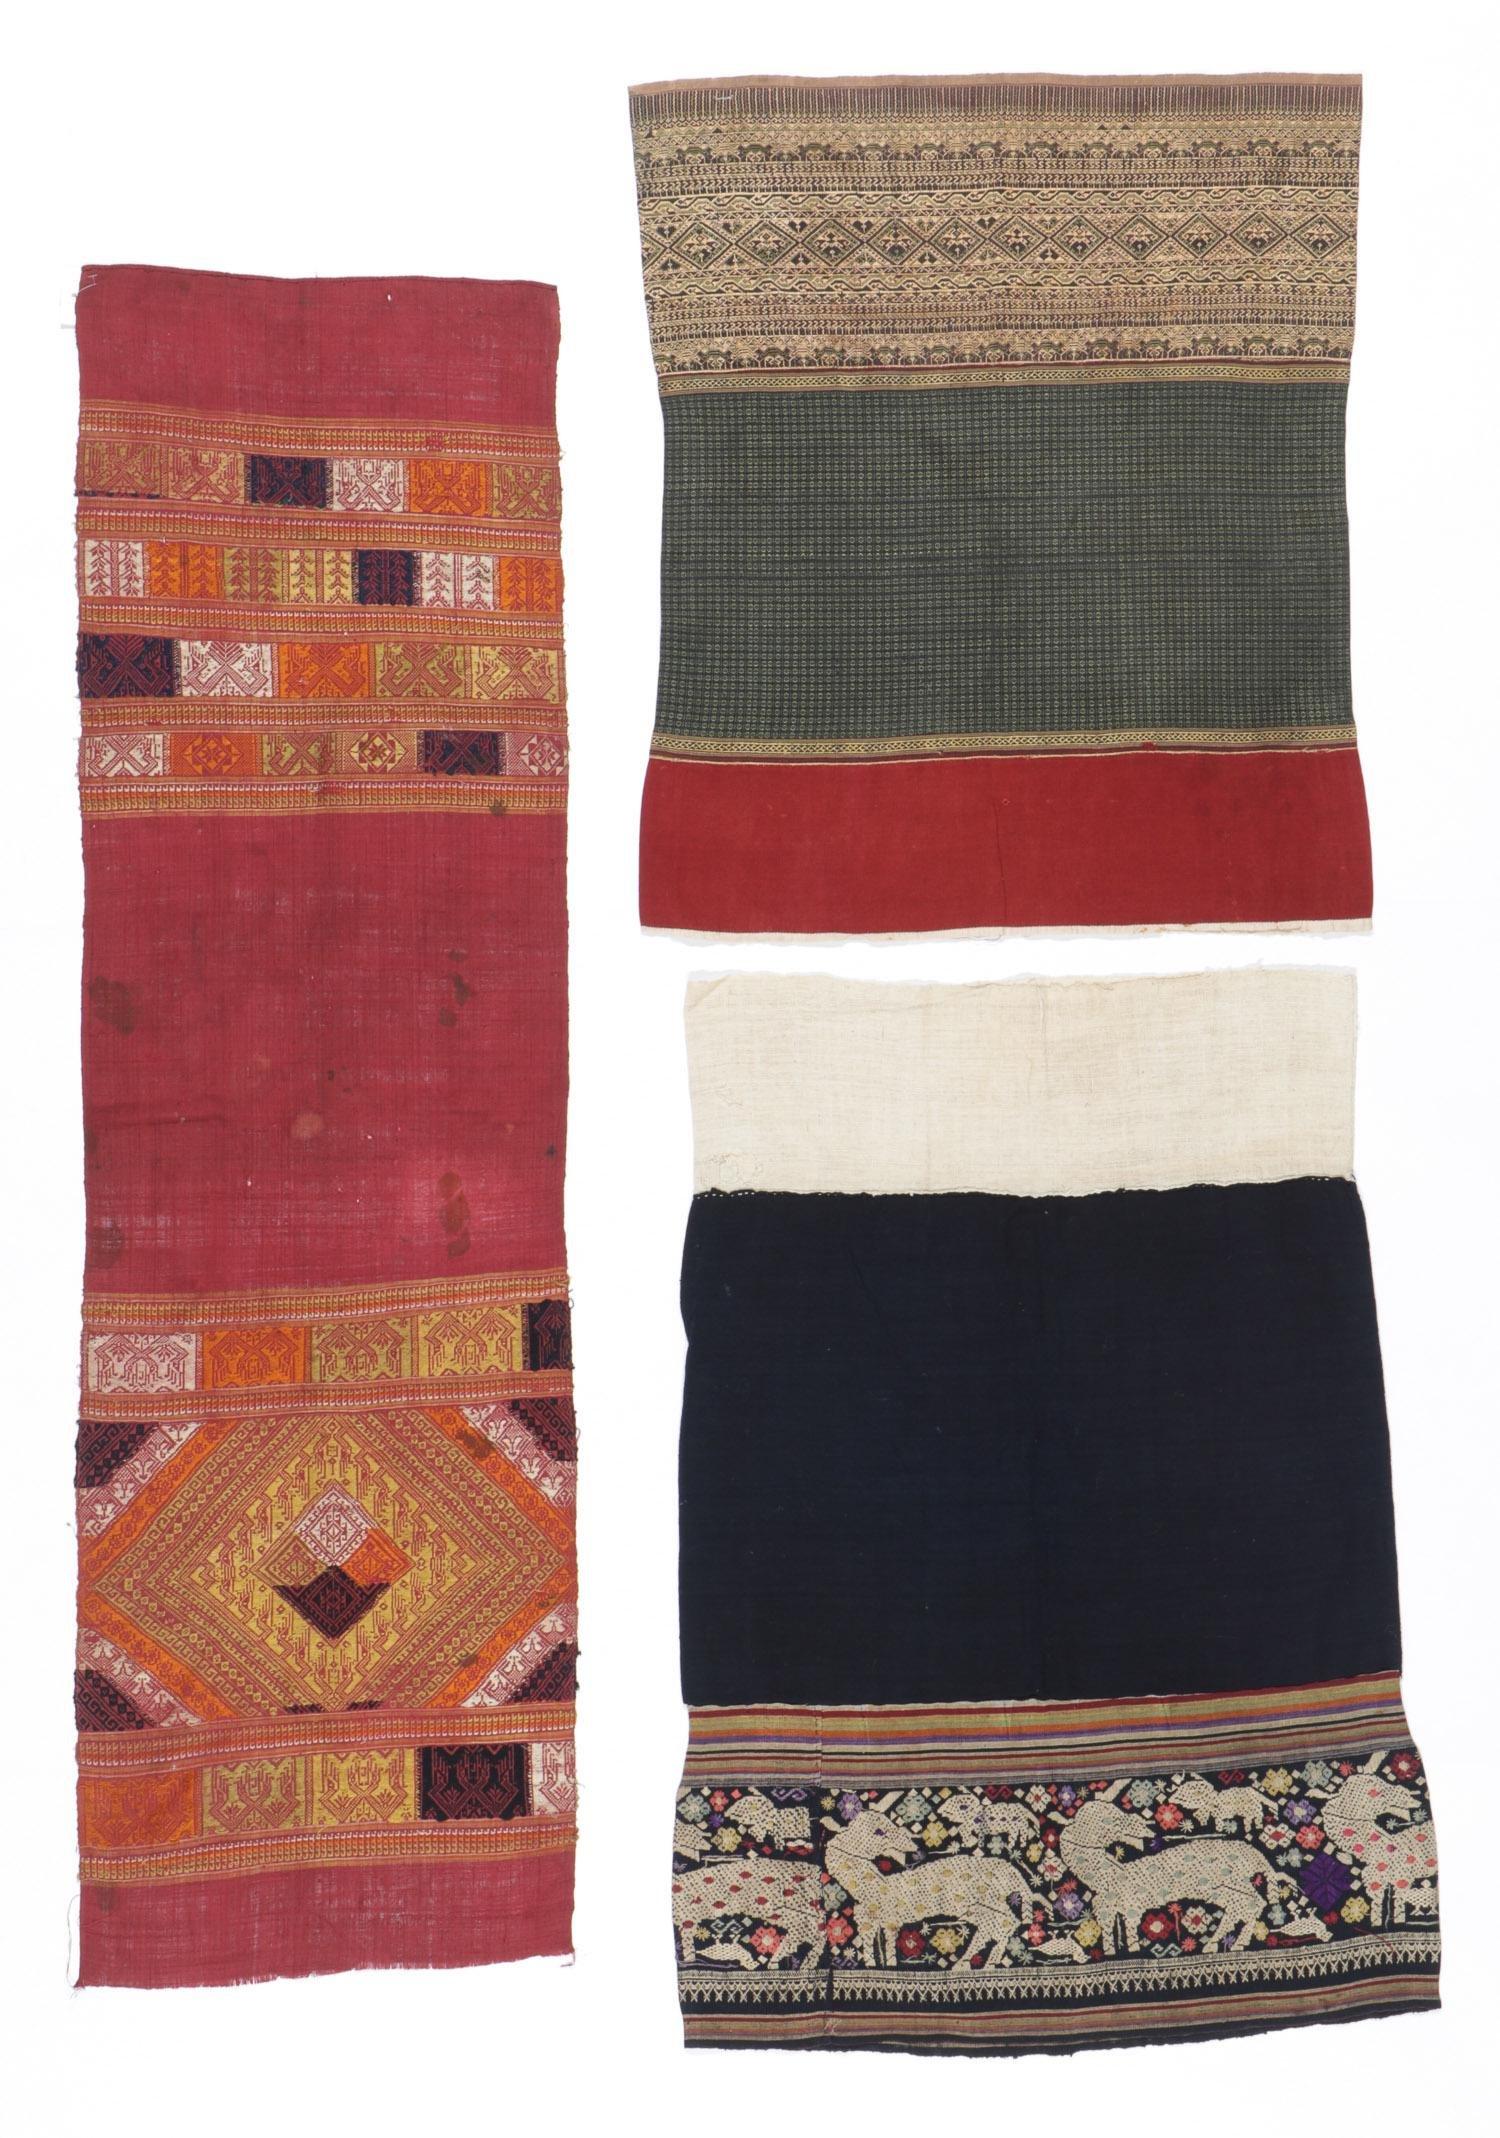 3 Antique Southeast Asian Woven Textiles